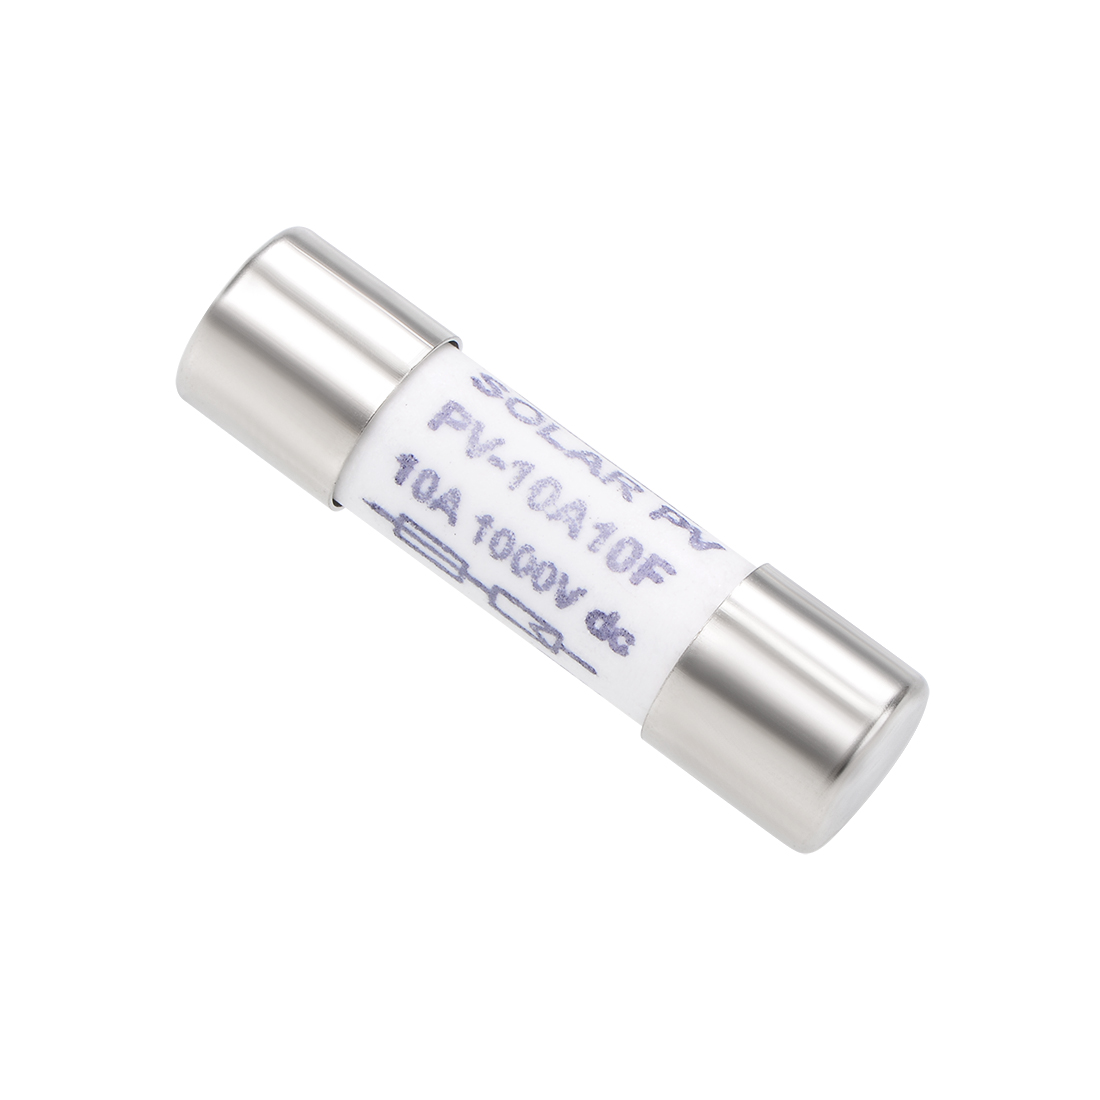 Cartridge Fuses 10A 1000V 10x38mm Fast Blow Audio Amplifier Ceramic